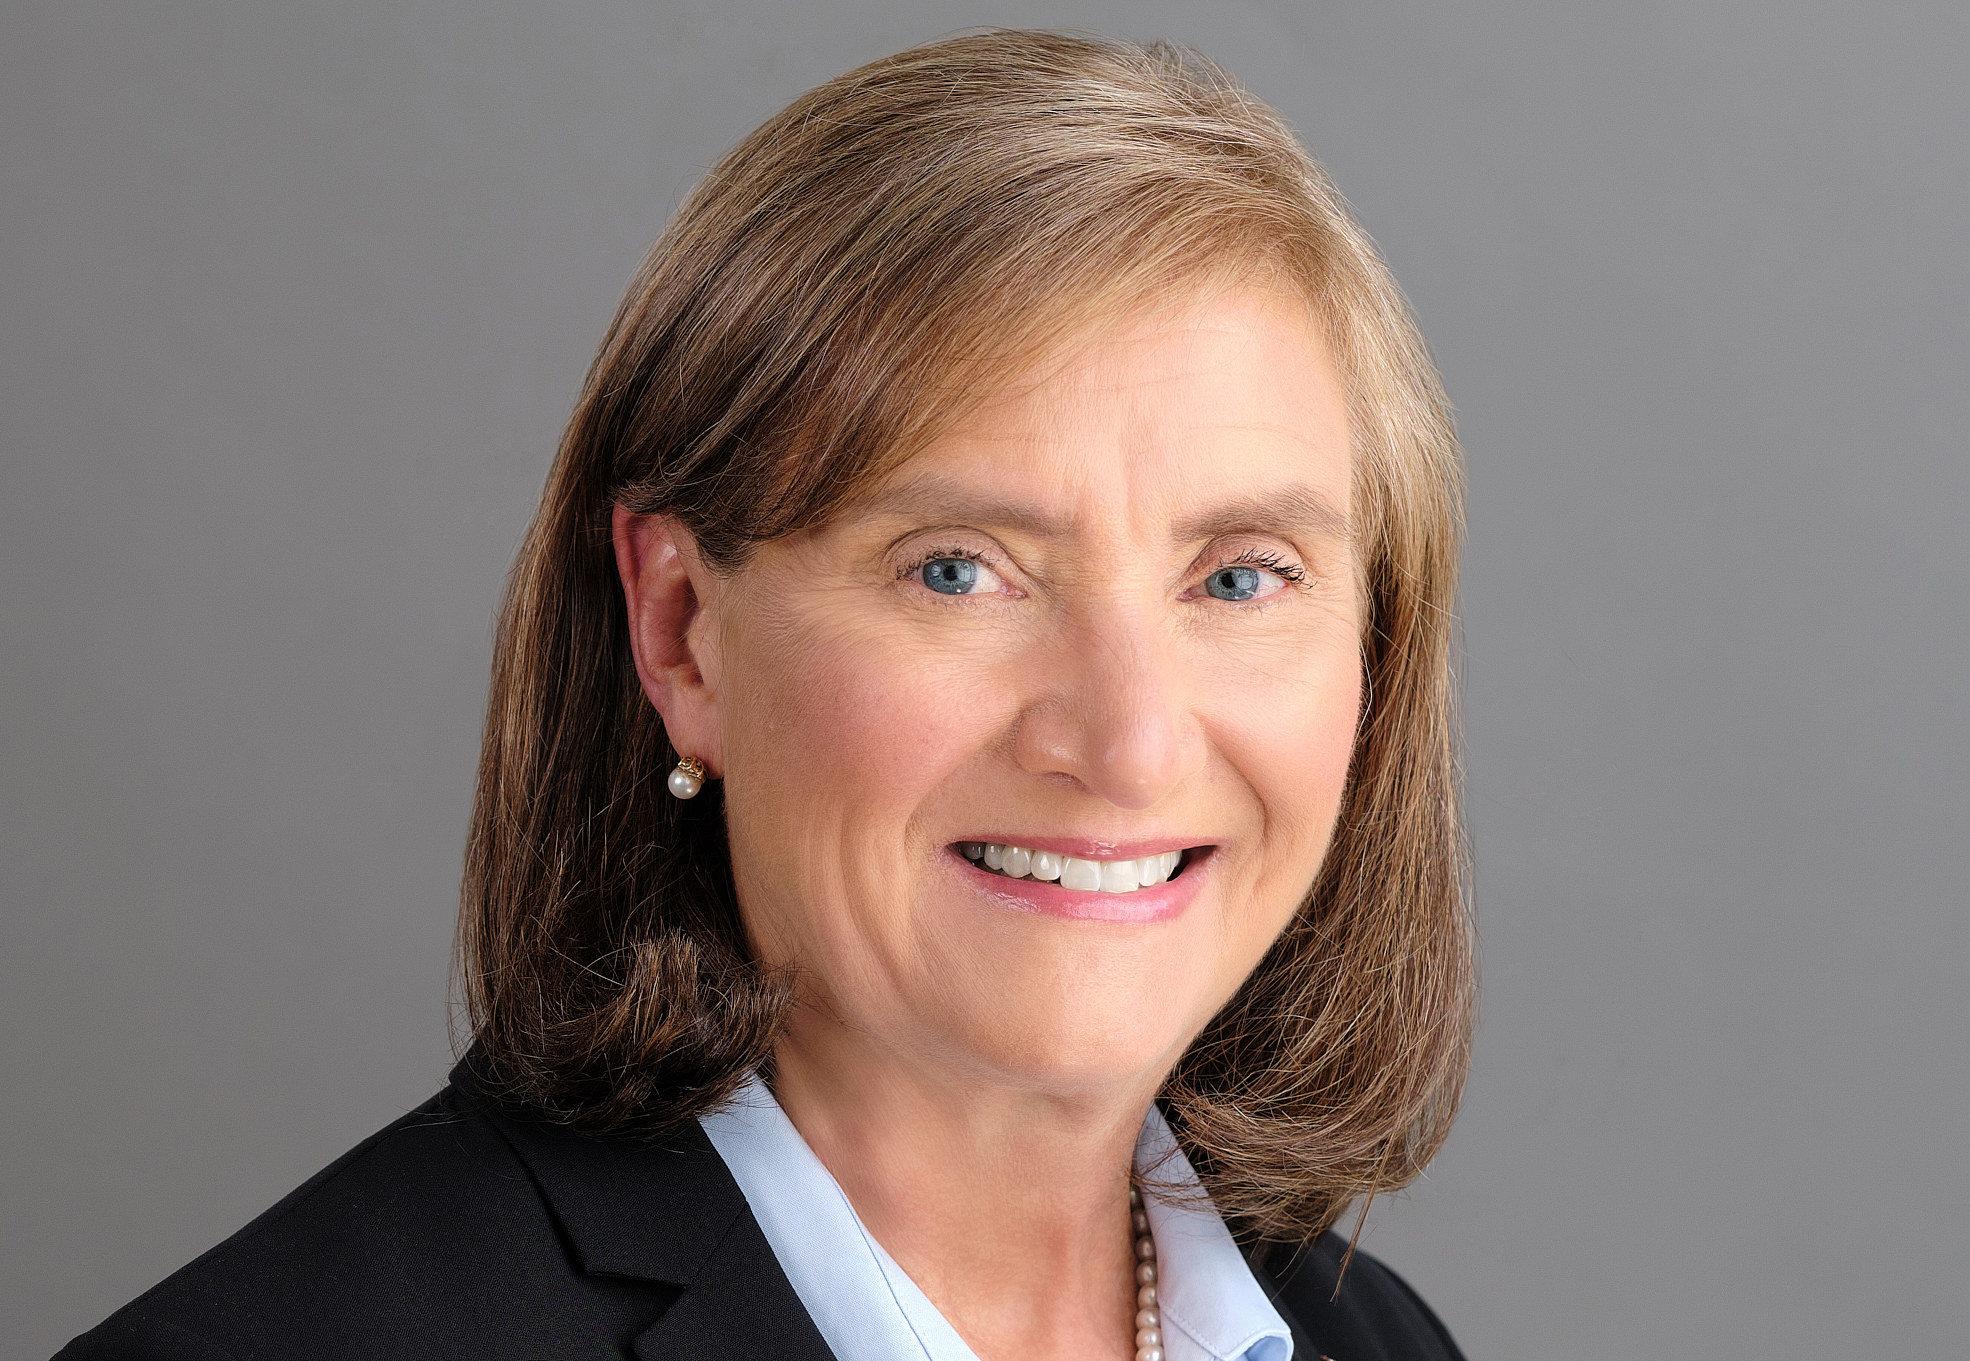 Photo of Christine E. Seidman, M.D.